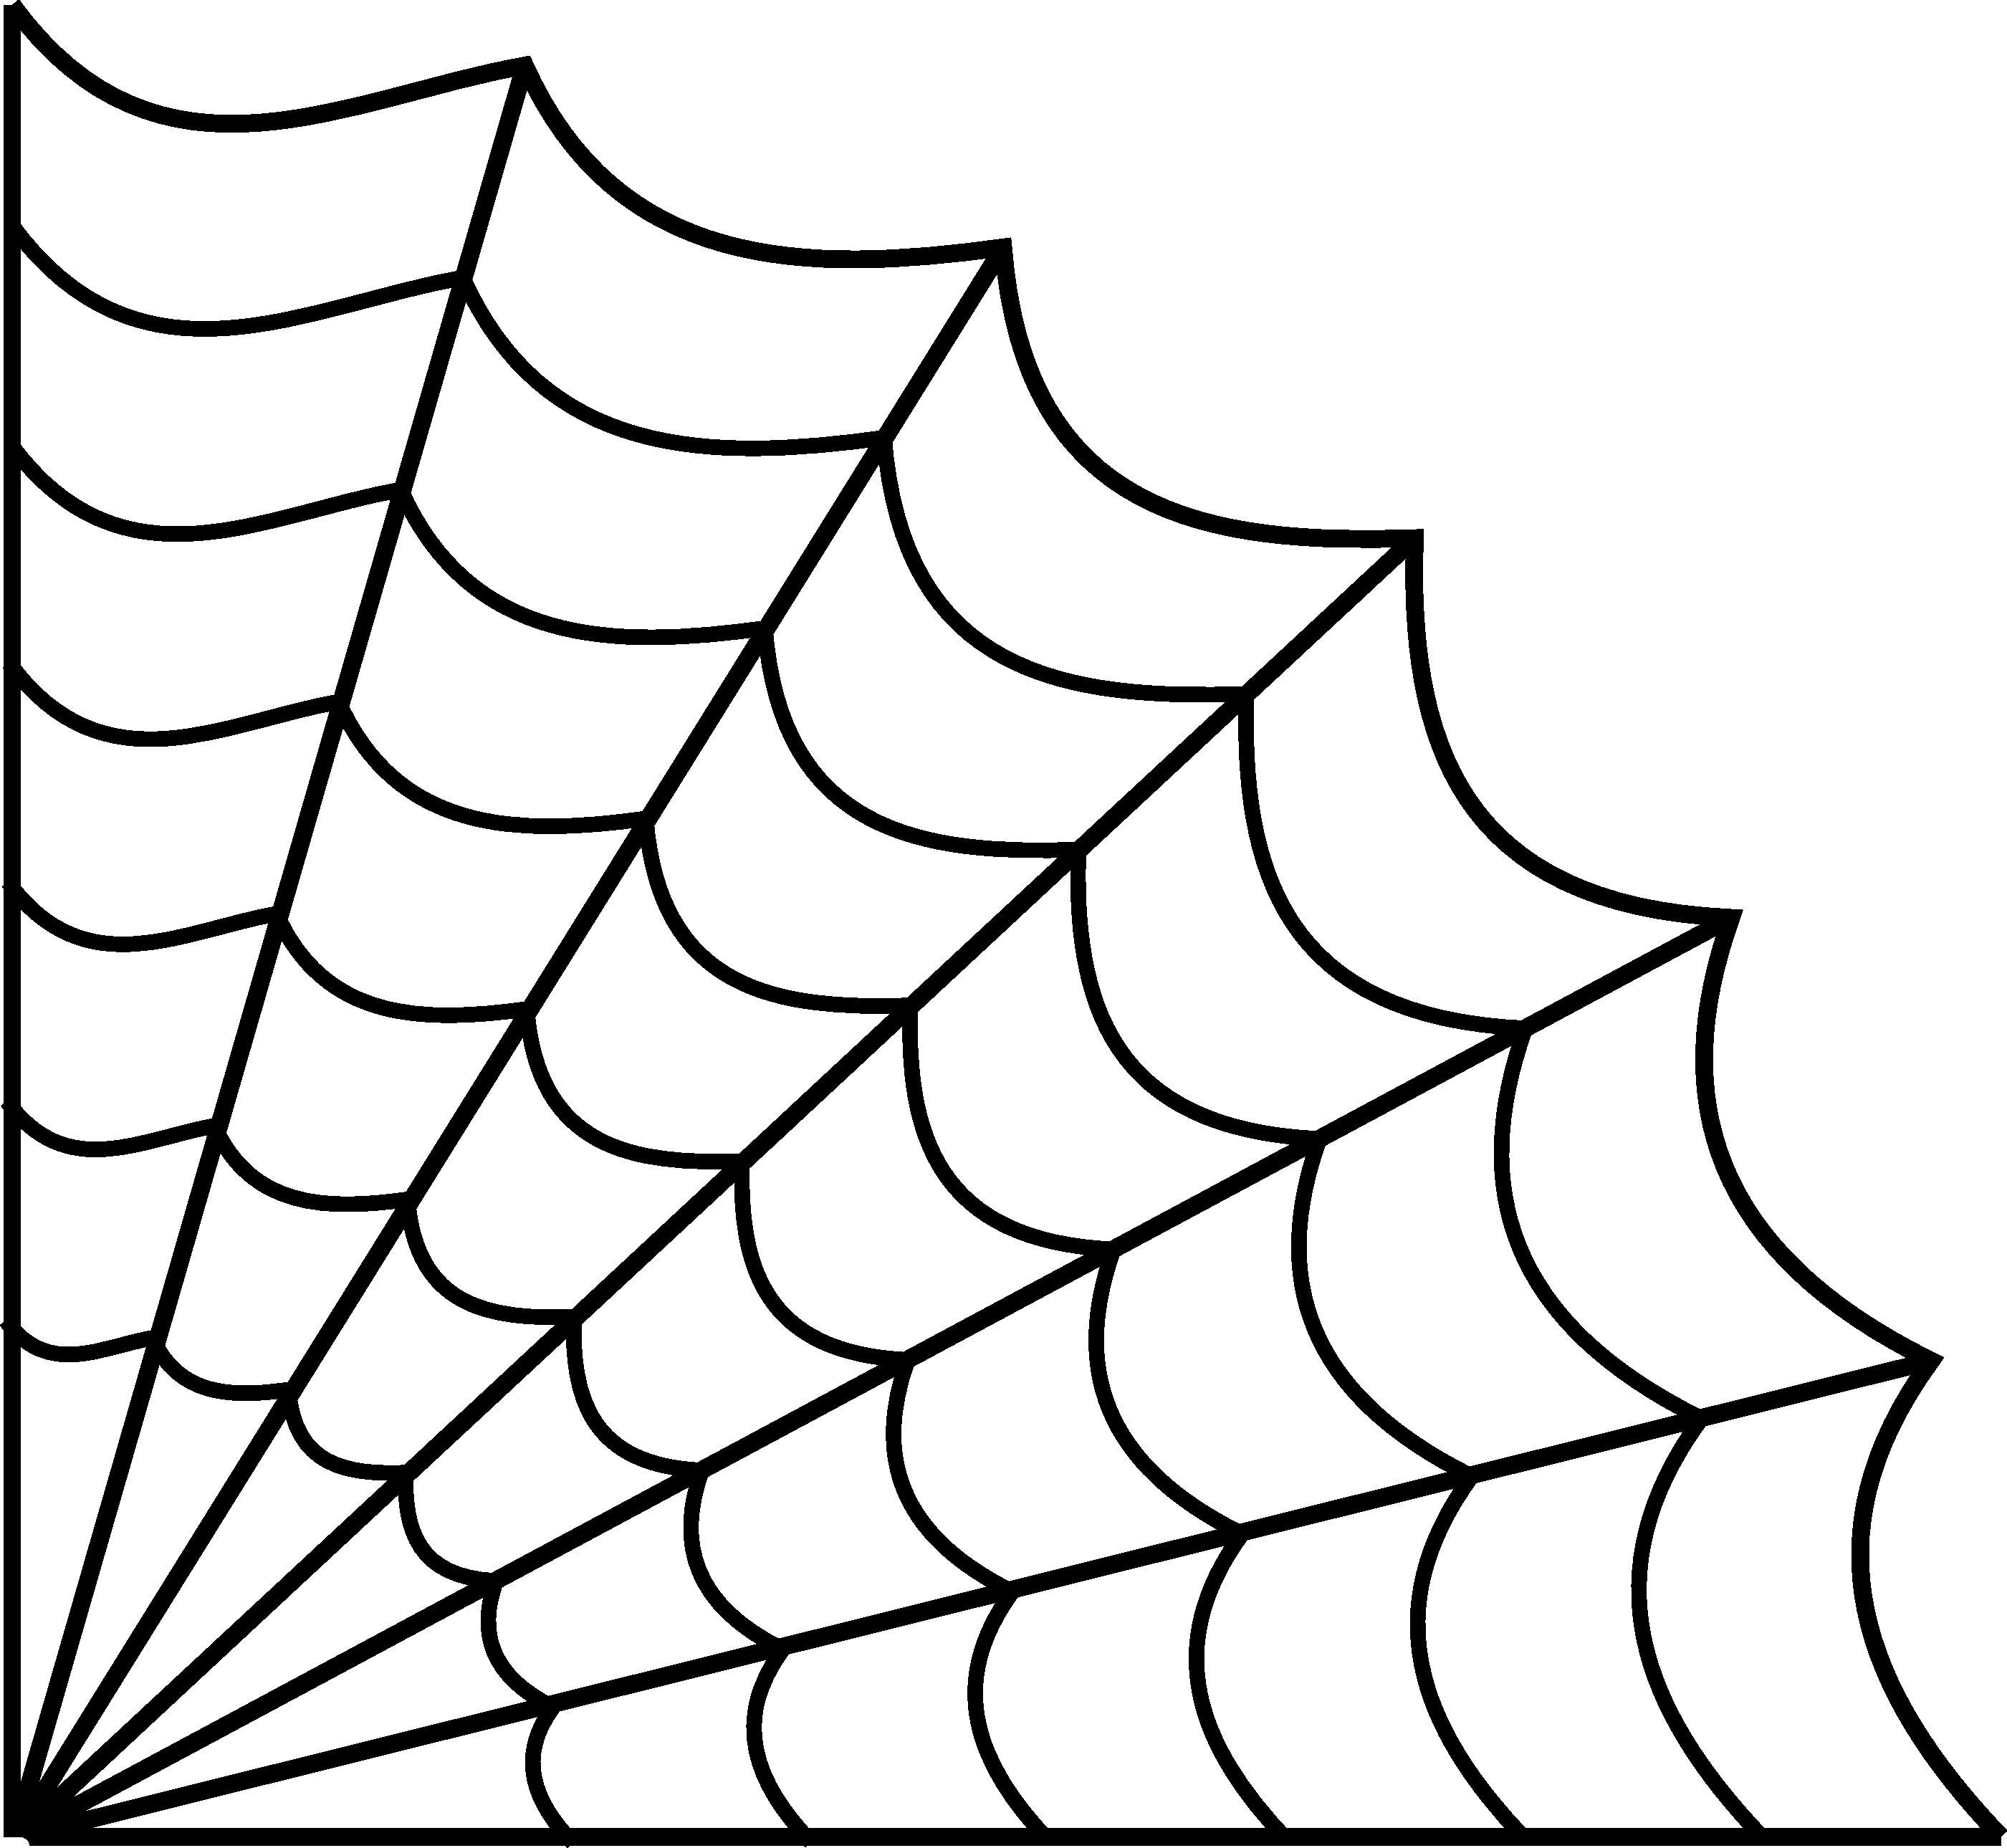 2801x2579 Drawn Spider Web Line Drawing